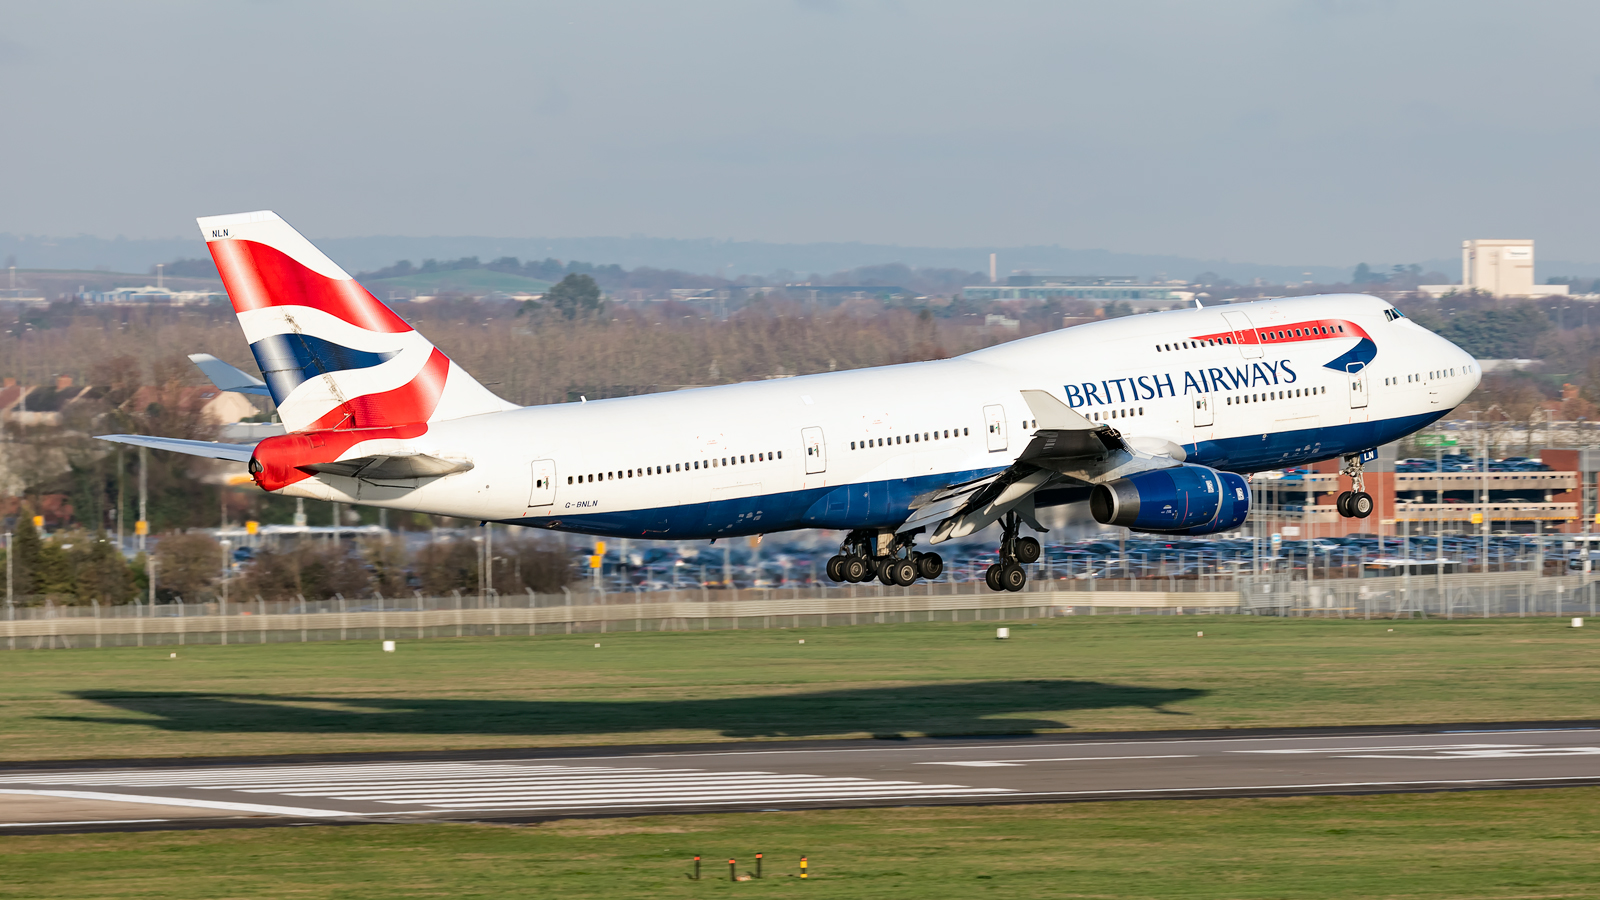 Click image for larger version.  Name:BA-744-shadow-landing-web-copy.jpg Views:31 Size:781.9 KB ID:20888